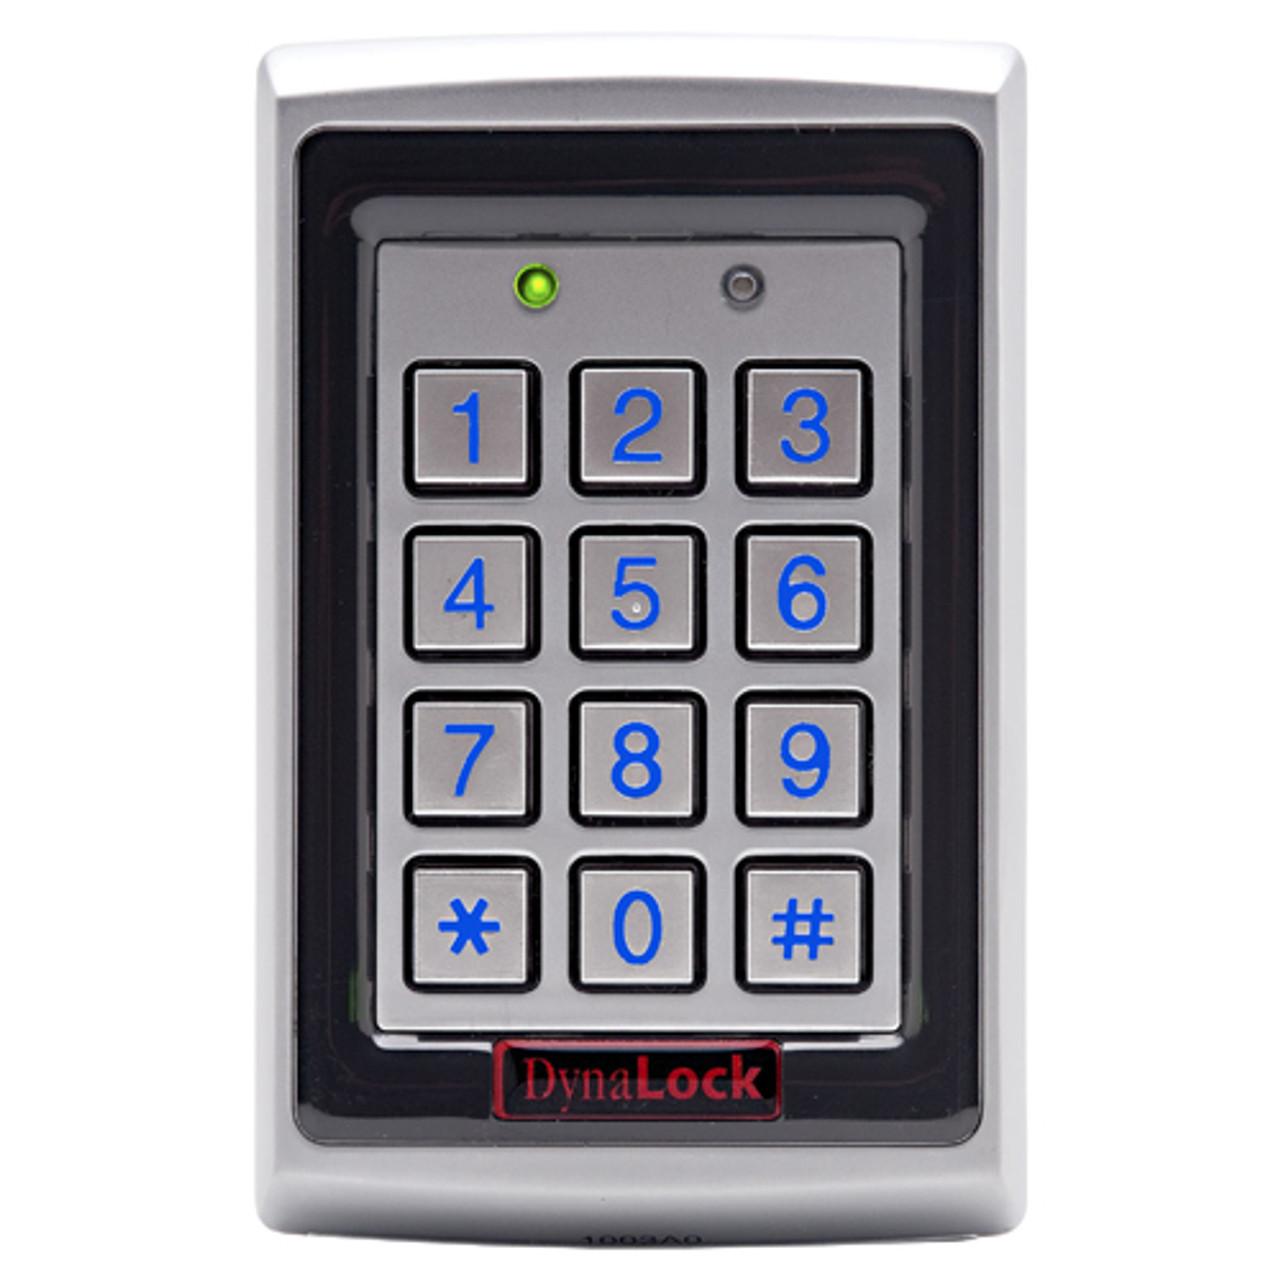 7500 DynaLock 7500 Series Standalone Digital Keypad and Prox Reader Single Gang Box-Mount